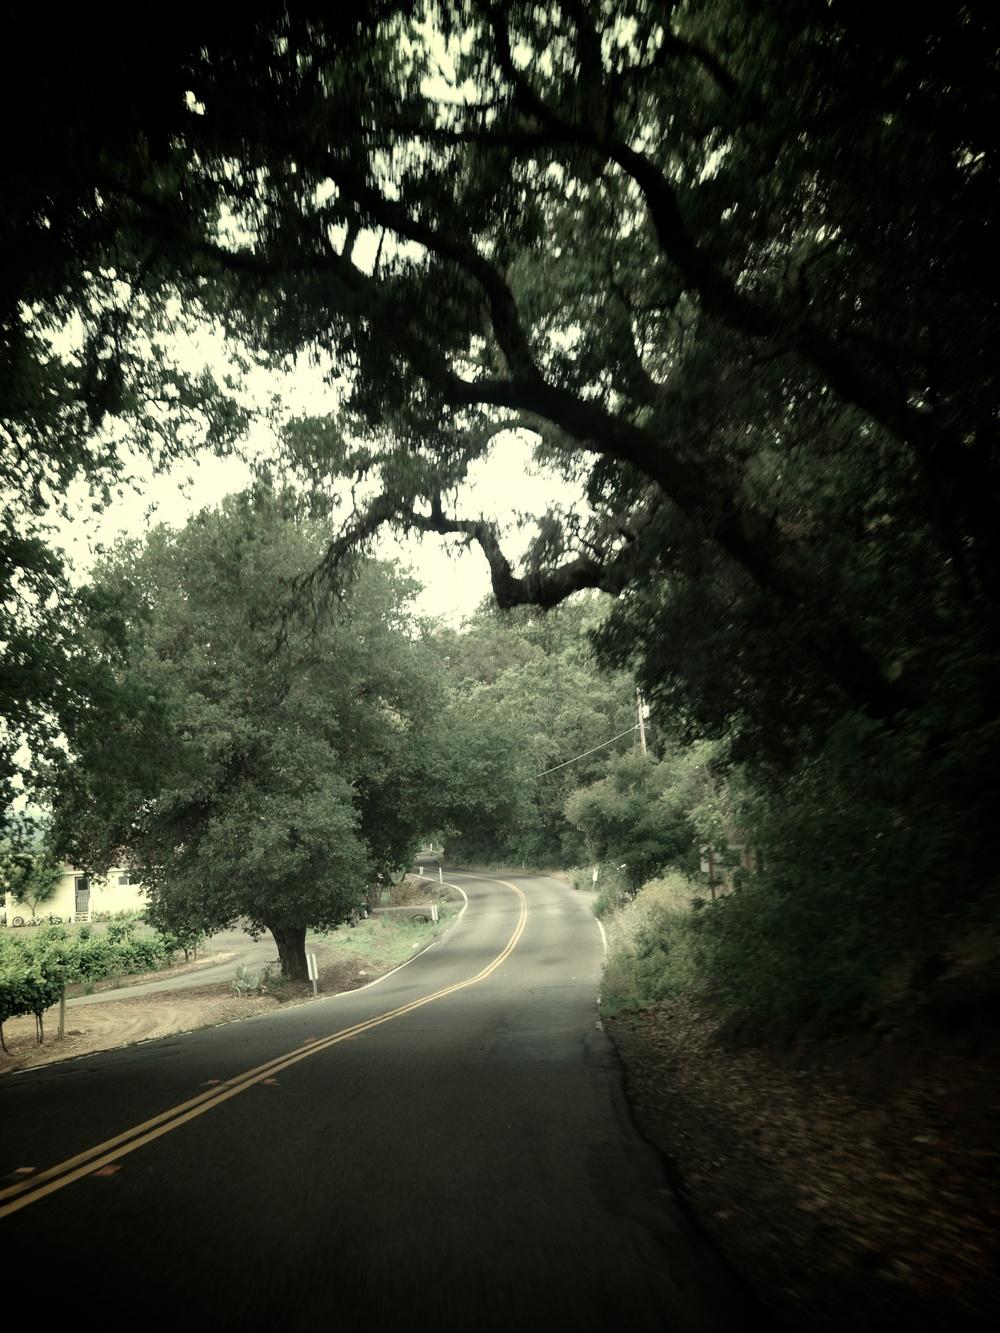 Western United States Road Trip Part 2 31.jpg